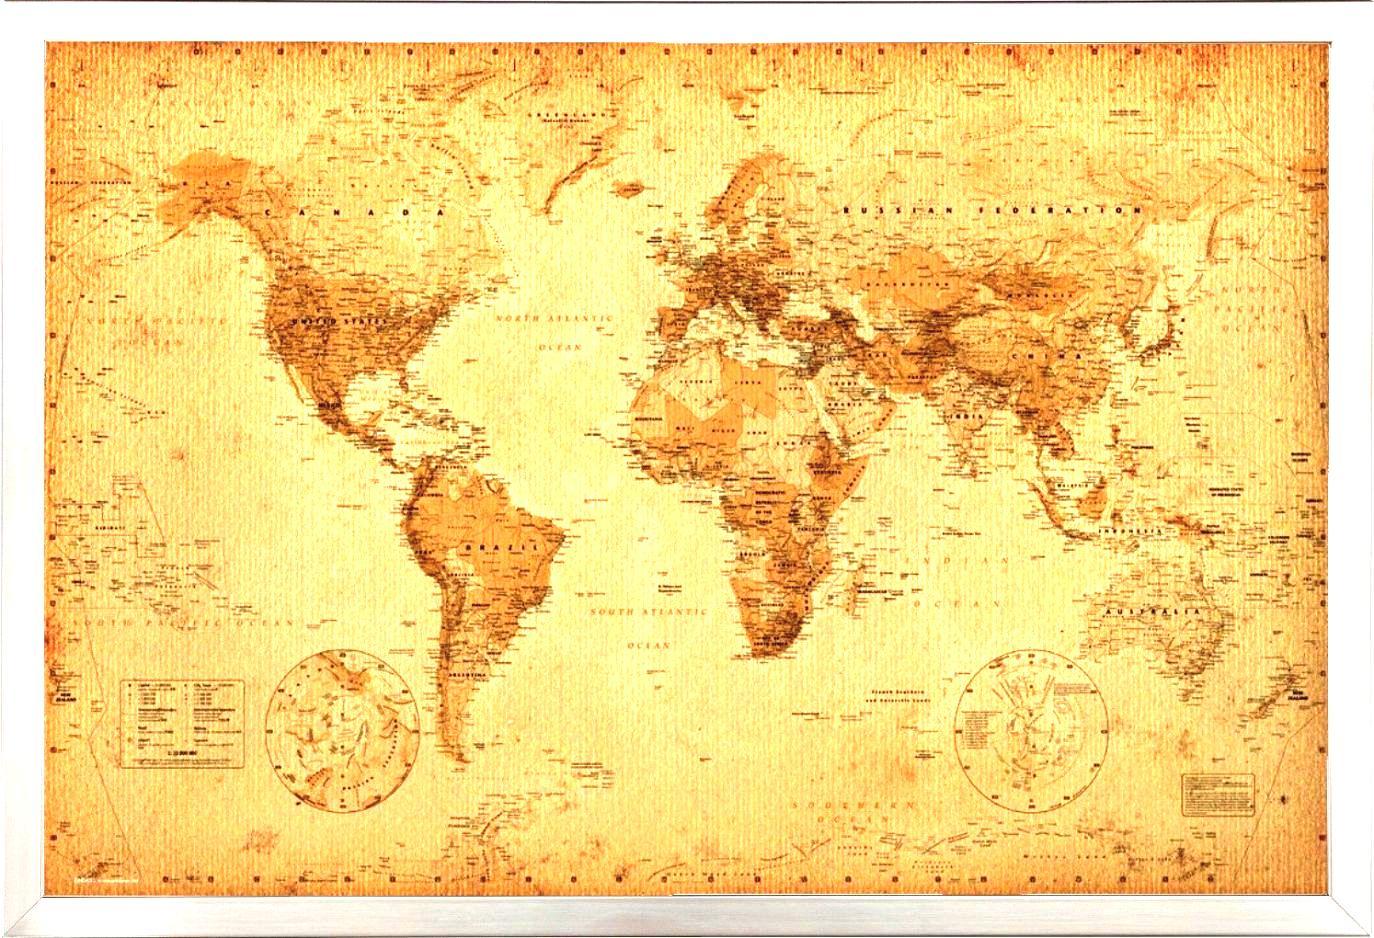 vintage world map tumblr antique desktop wallpaper lmmqwyl sl